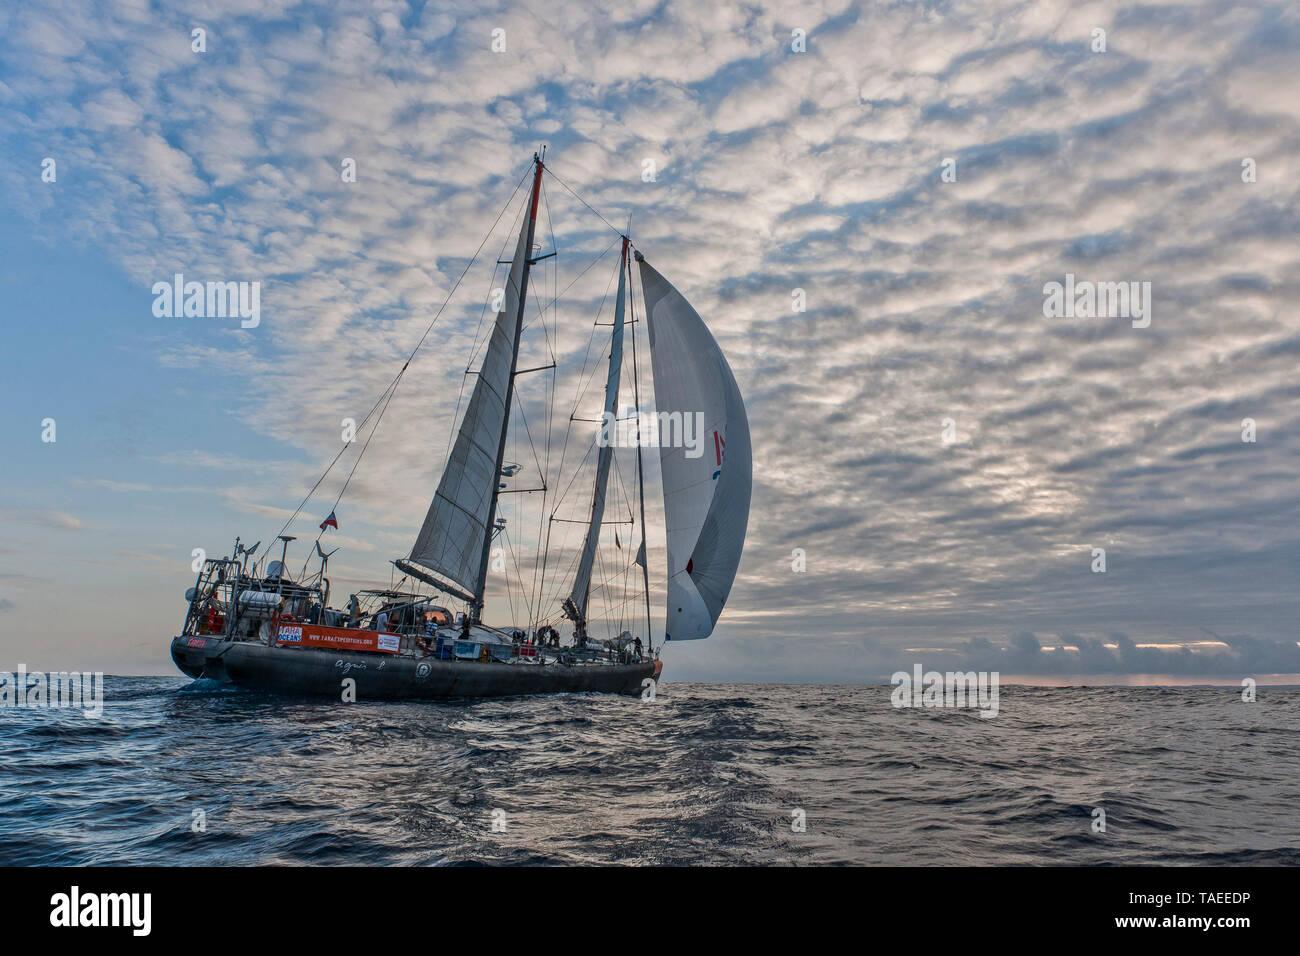 Tara Oceans Expeditions - Mayo de 2011. Velero Tara; Guayaquil-Galapagos pierna; Ecuador Foto de stock